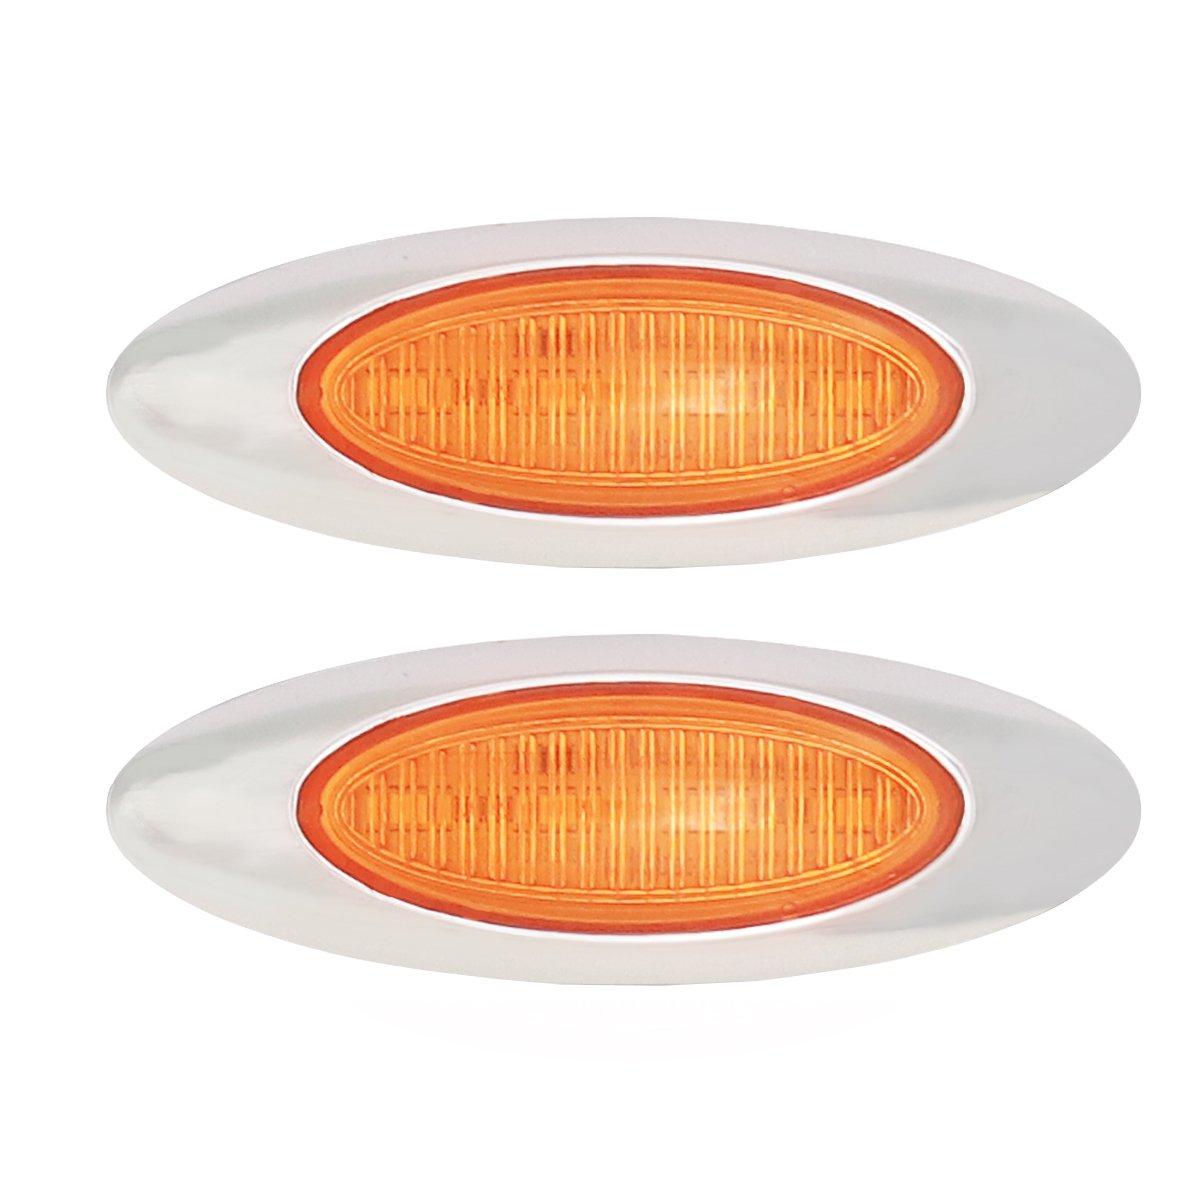 BlyilyB 2-Pack Waterproof Flush Mount 6 Oval Red LED Tail Stop Brake Turn Trailer Lights